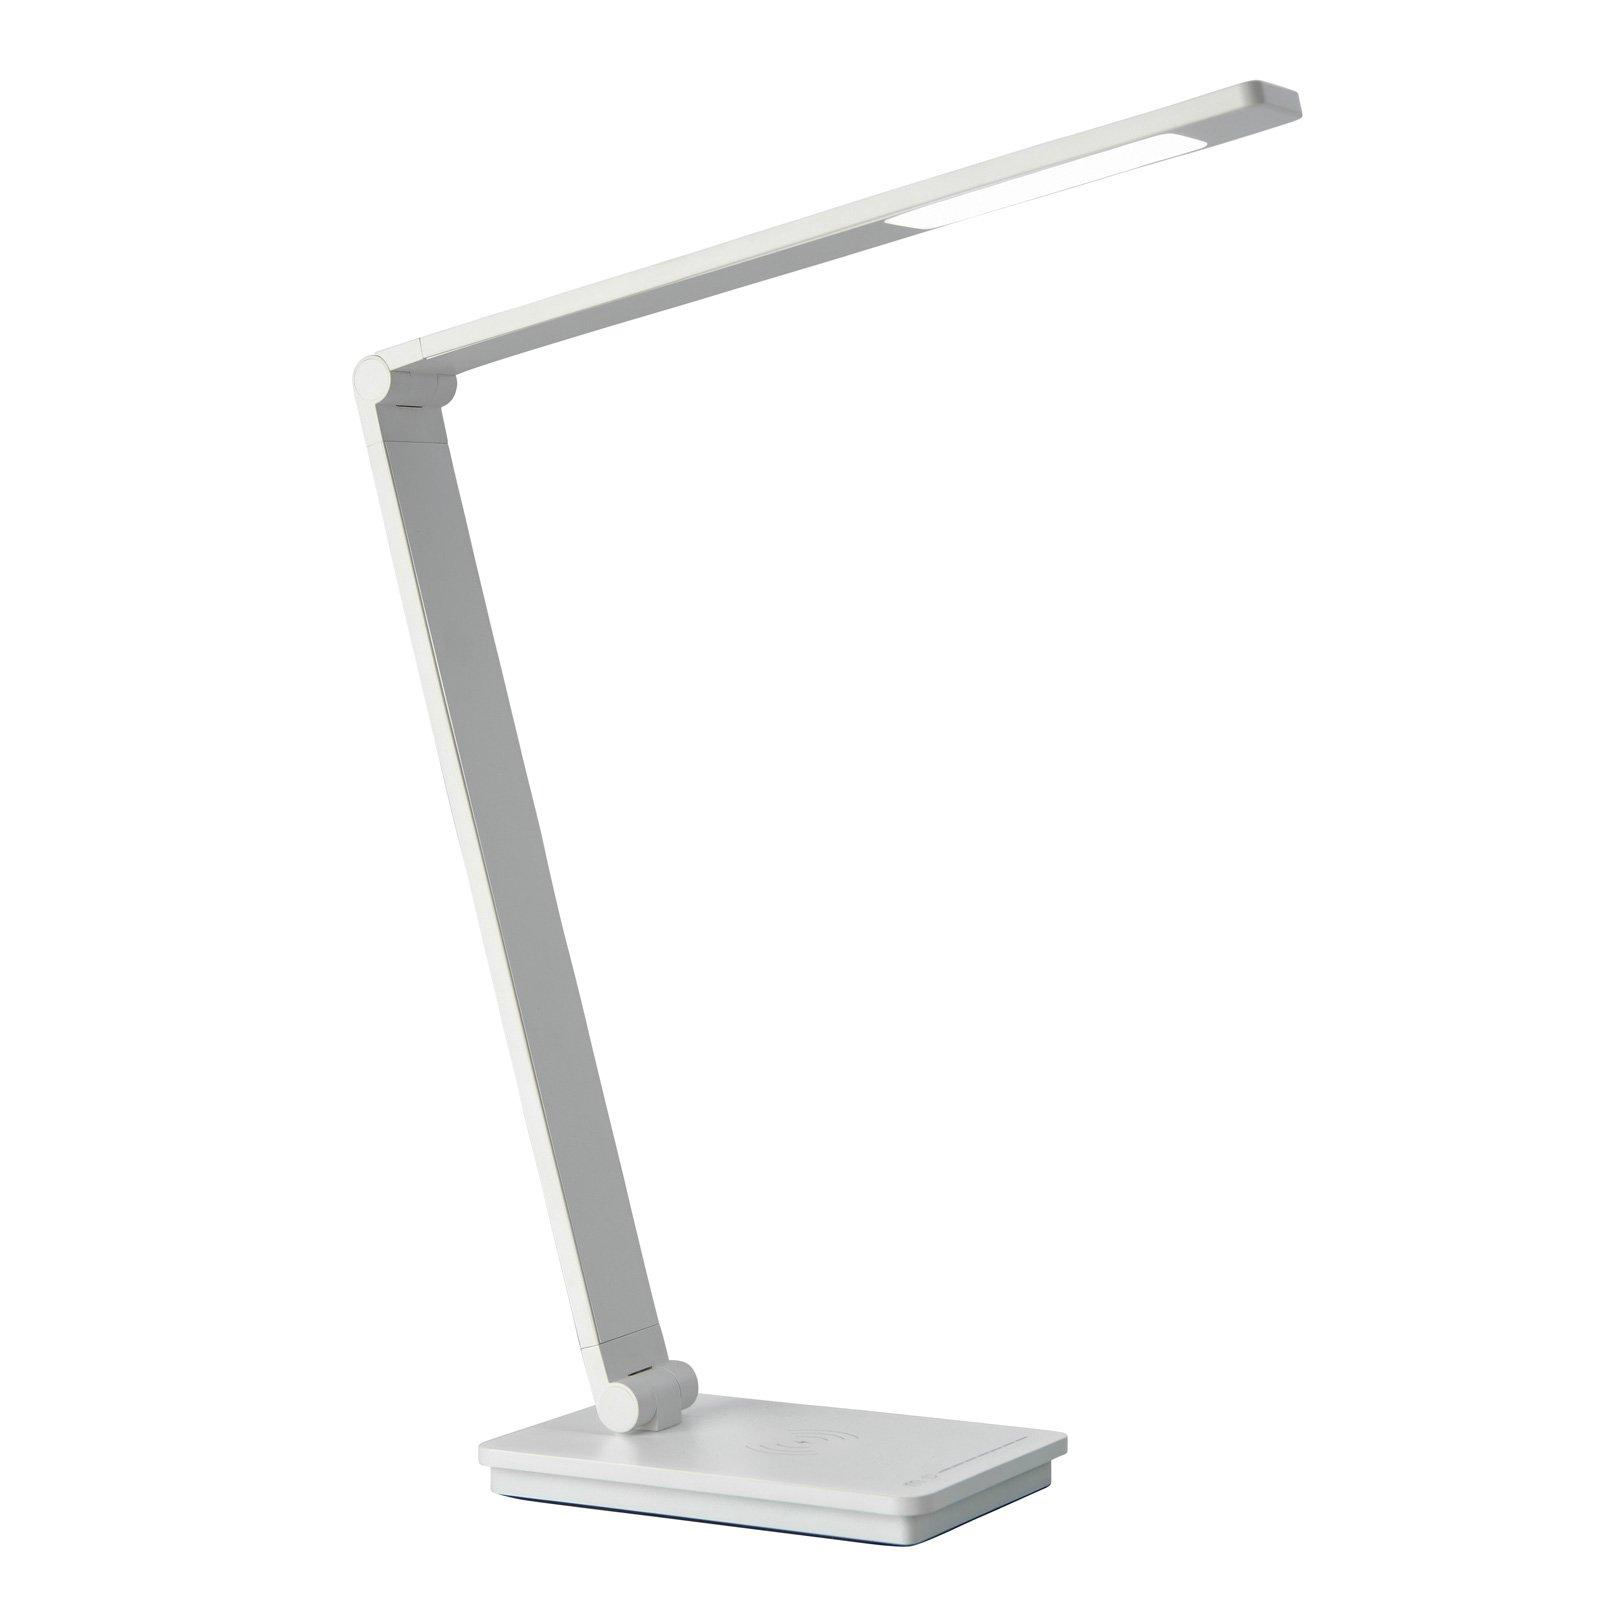 Skrivebordslampe Uli Phone, QI-ladestasjon, hvit